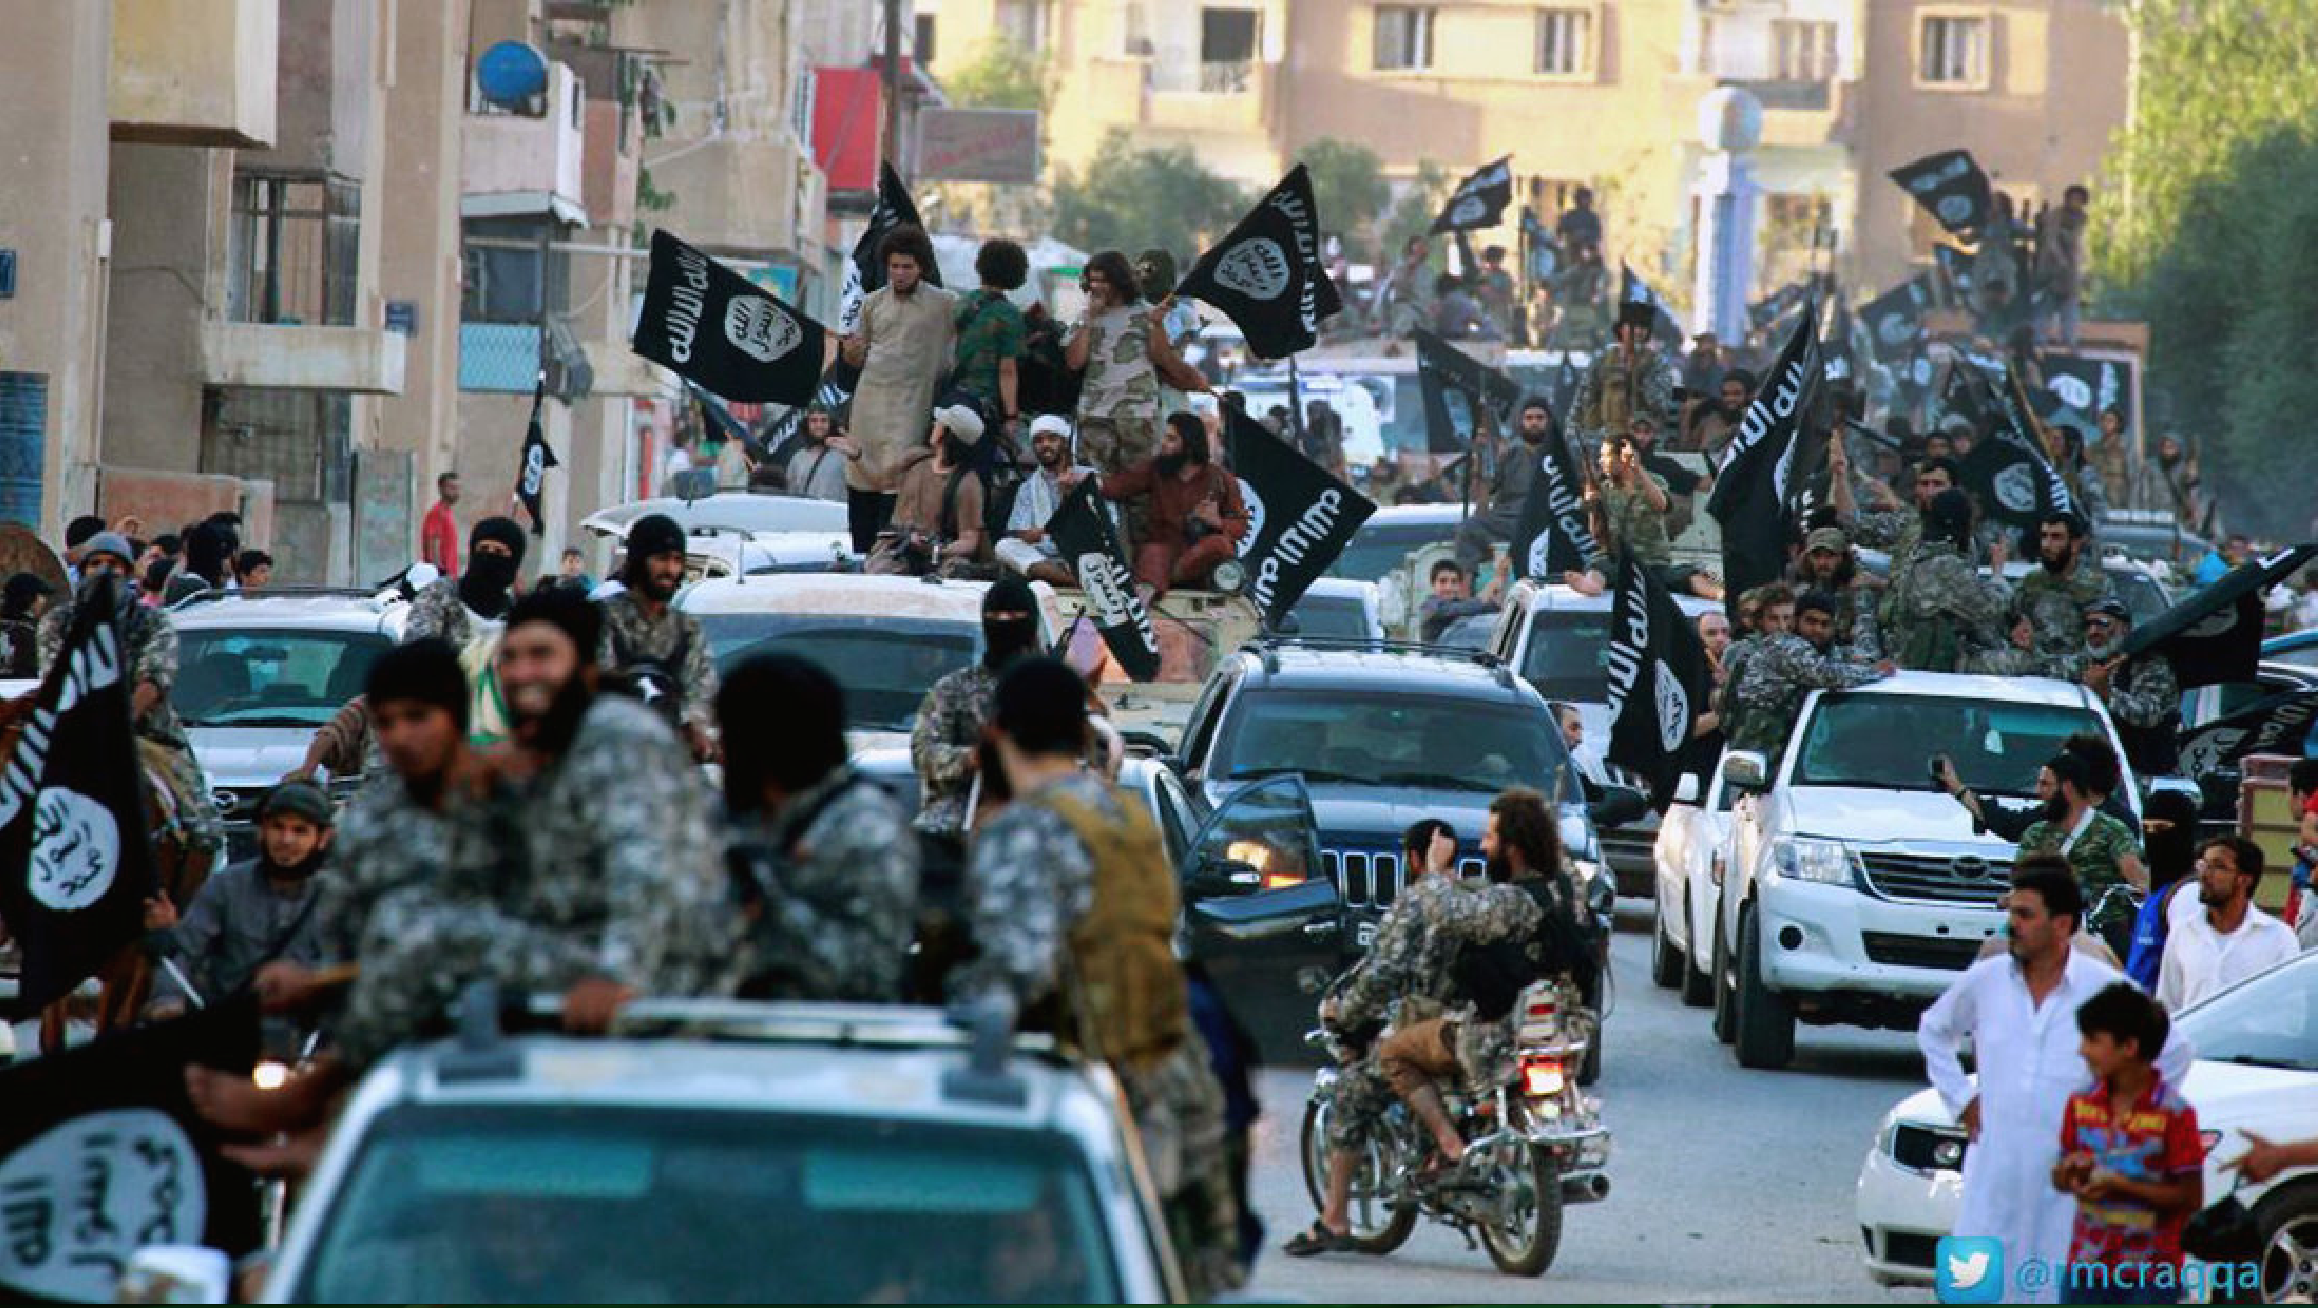 IS parade in Raqqa June 2014